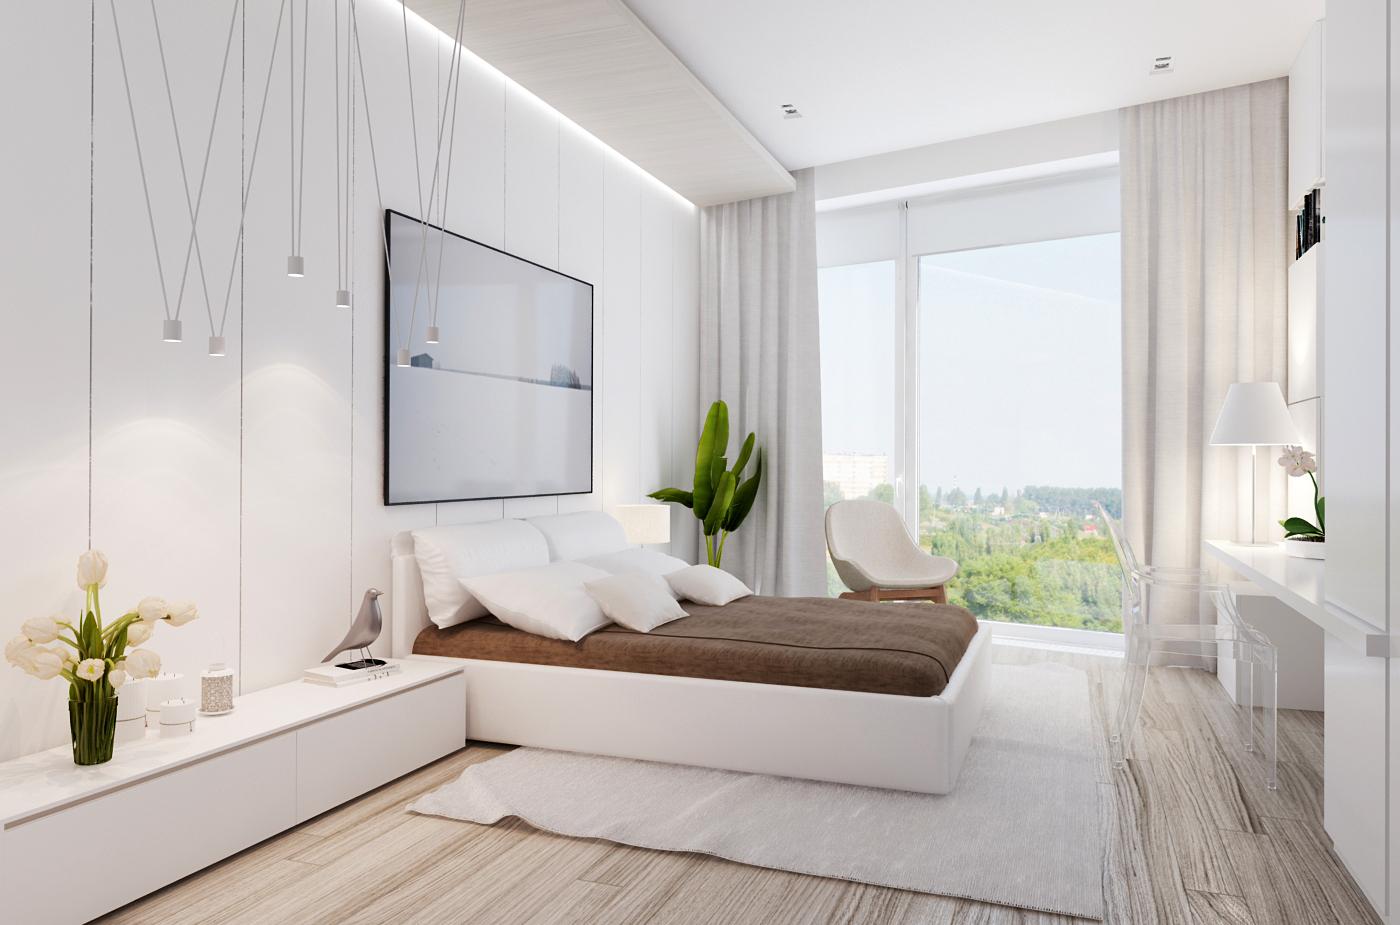 View In Gallery Hiasan Dalaman Dan Reka Bentuk Bilik Tidur Moden Mewah